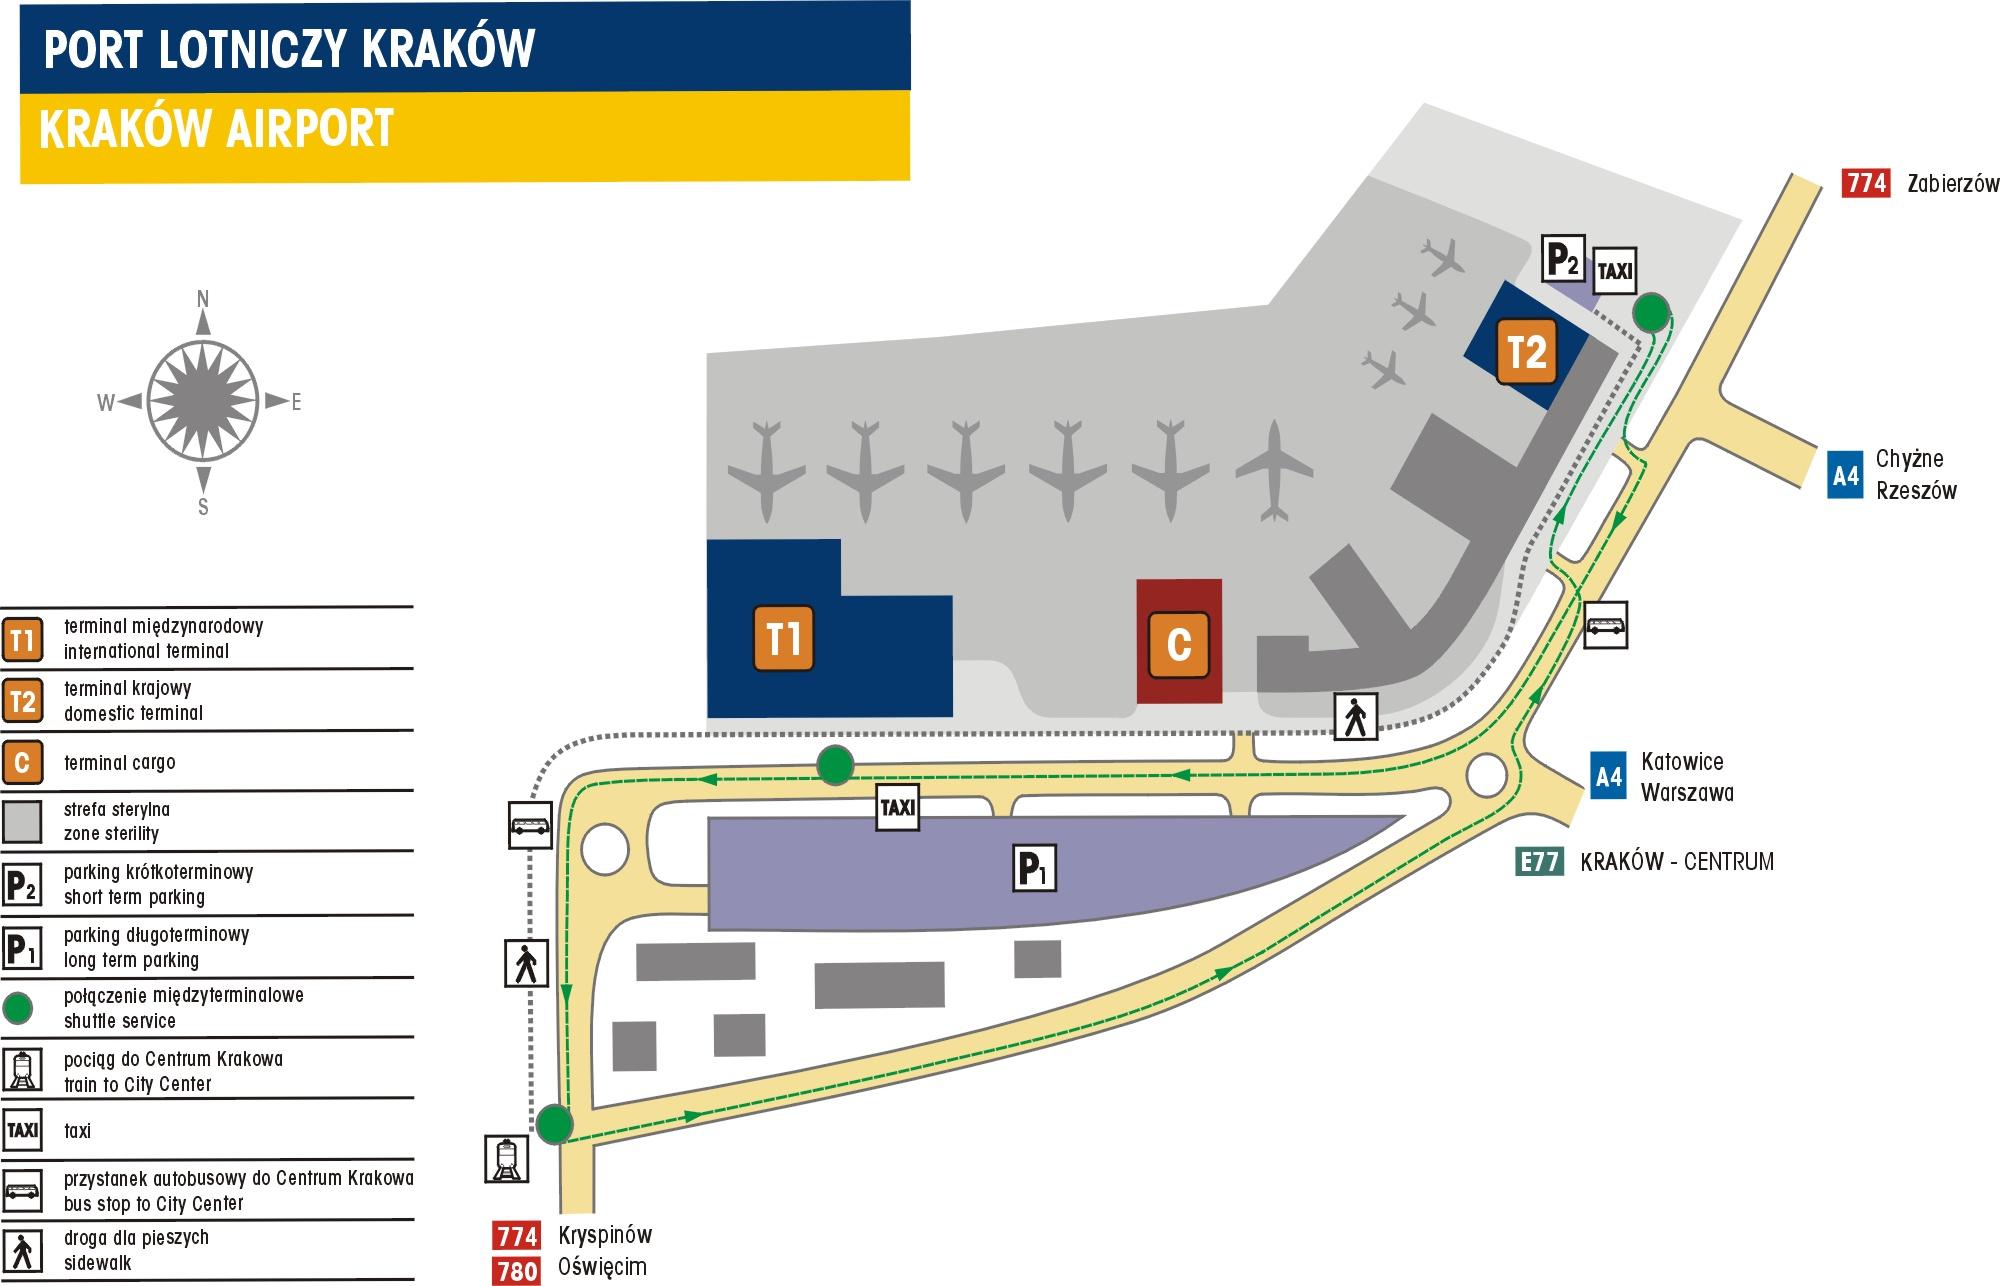 Krakow Airport Terminal Map FCAL 2008